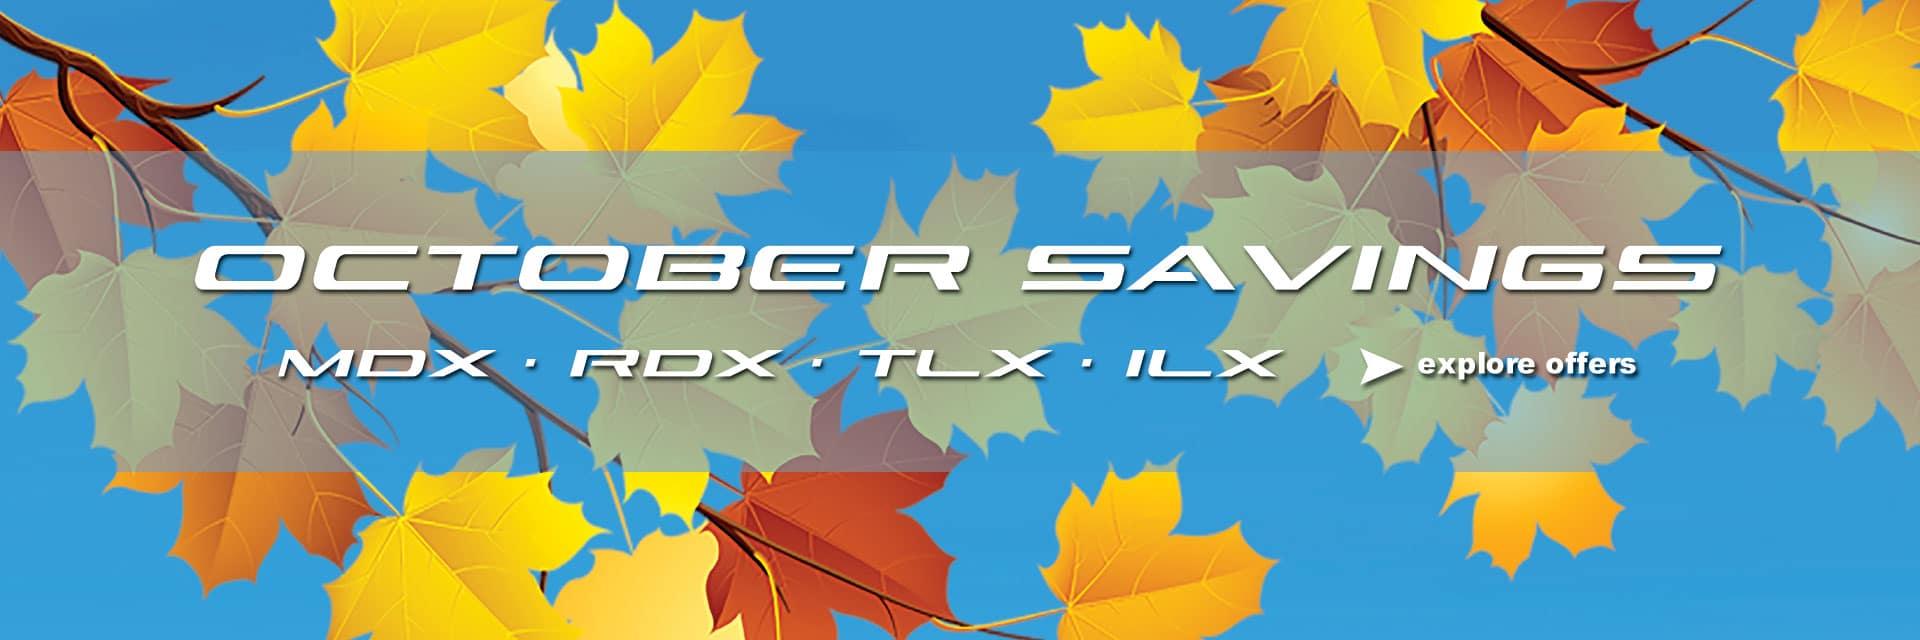 October Savings Event Sunnyside Acura Nashua NH 03063